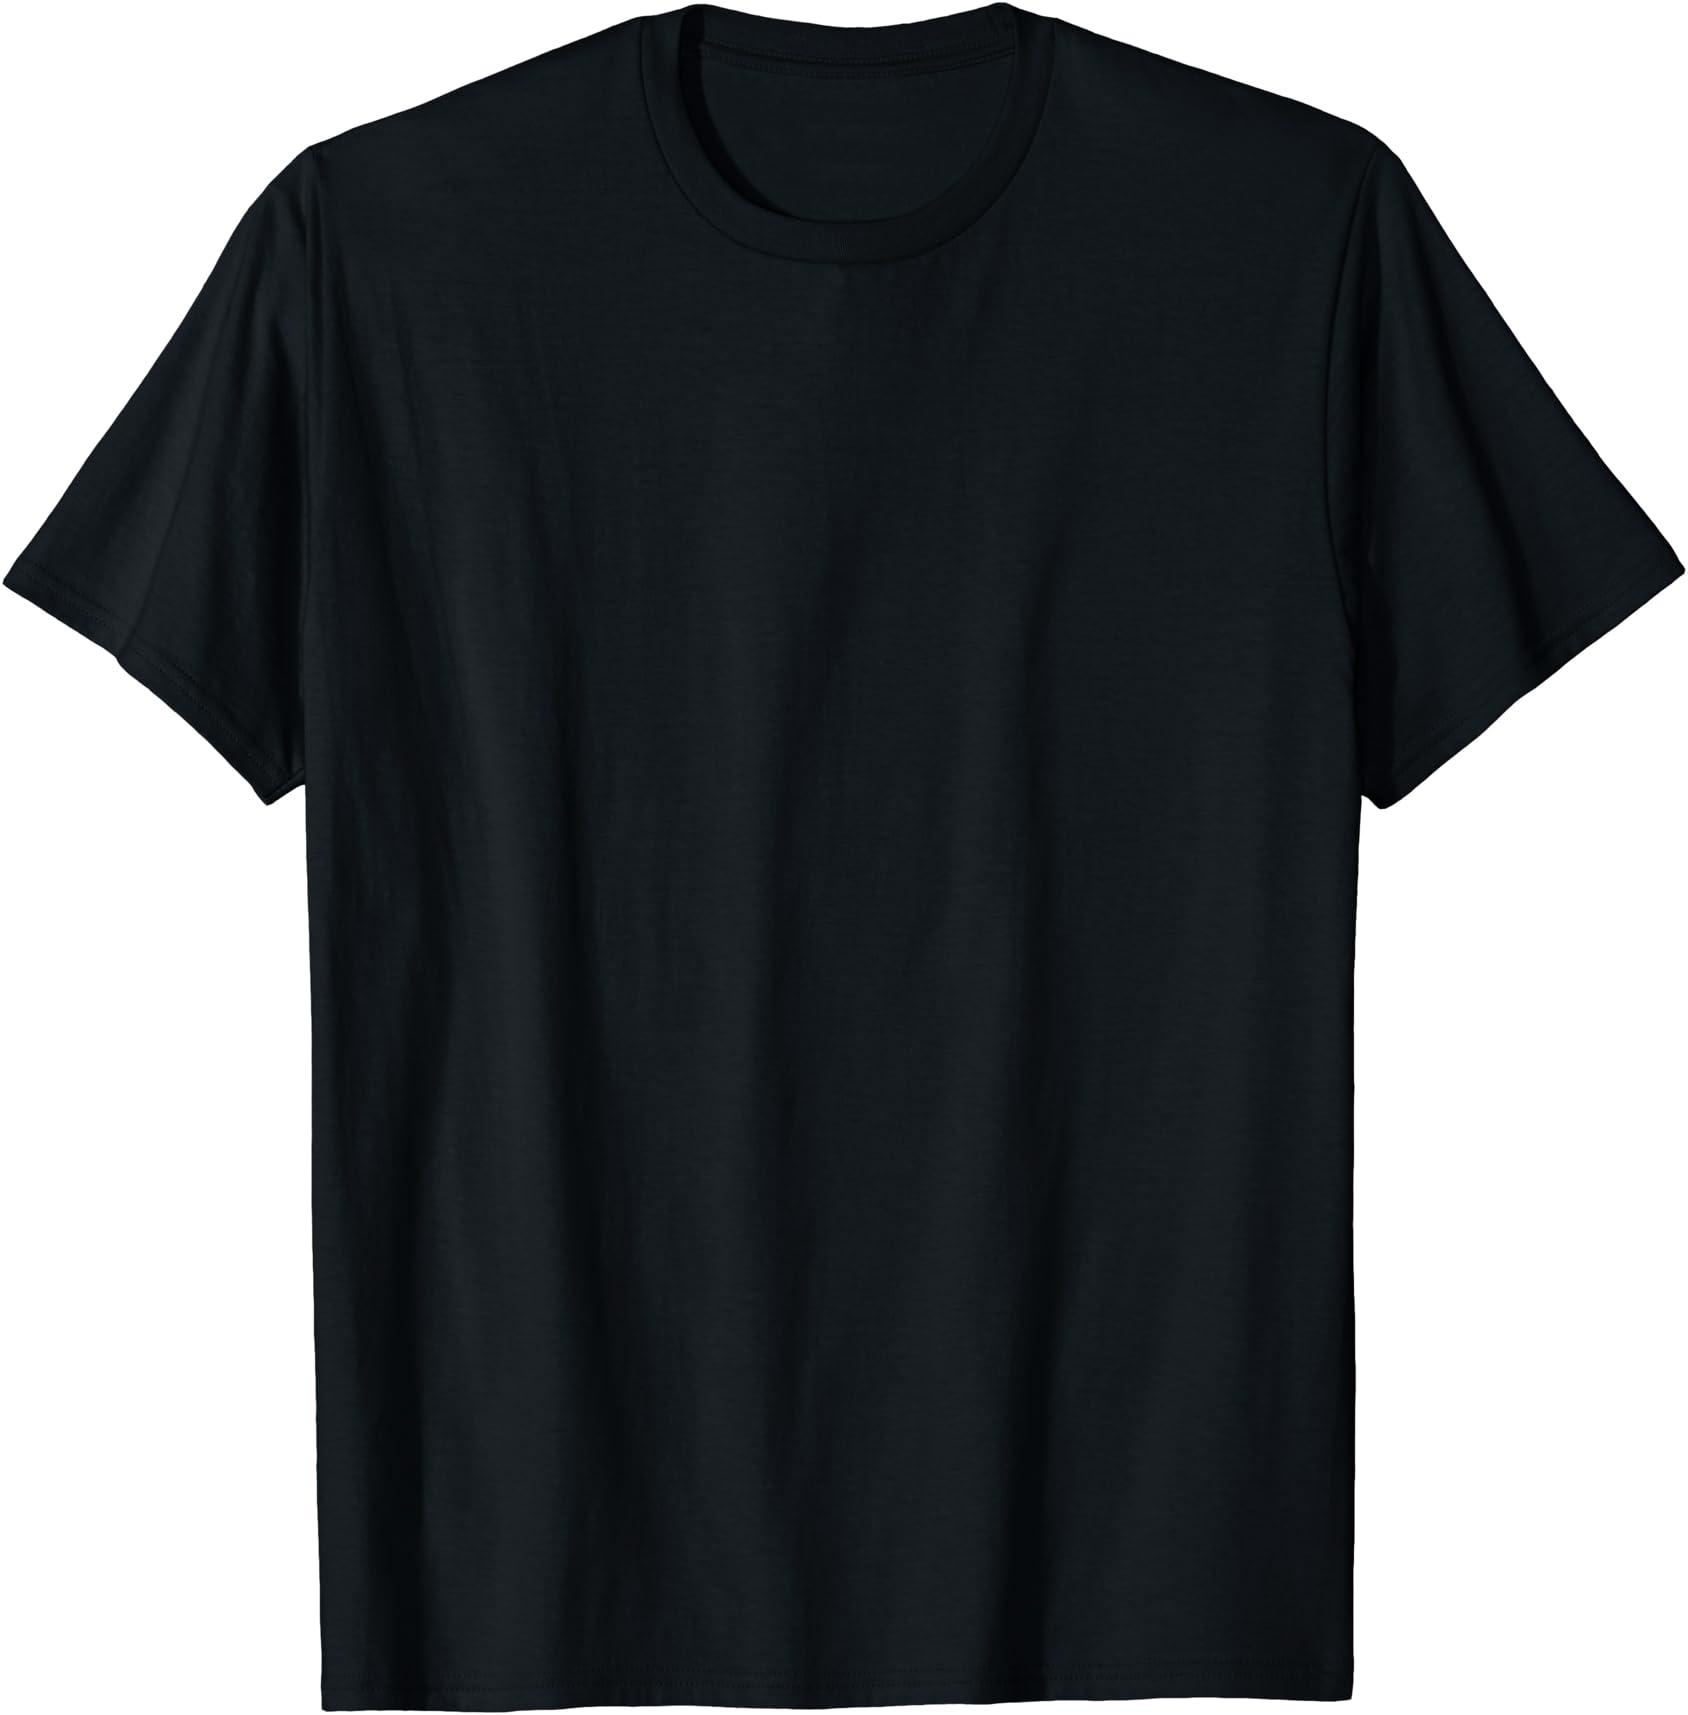 Mens Funny Sayings Slogans T Shirts-Muscles Loading